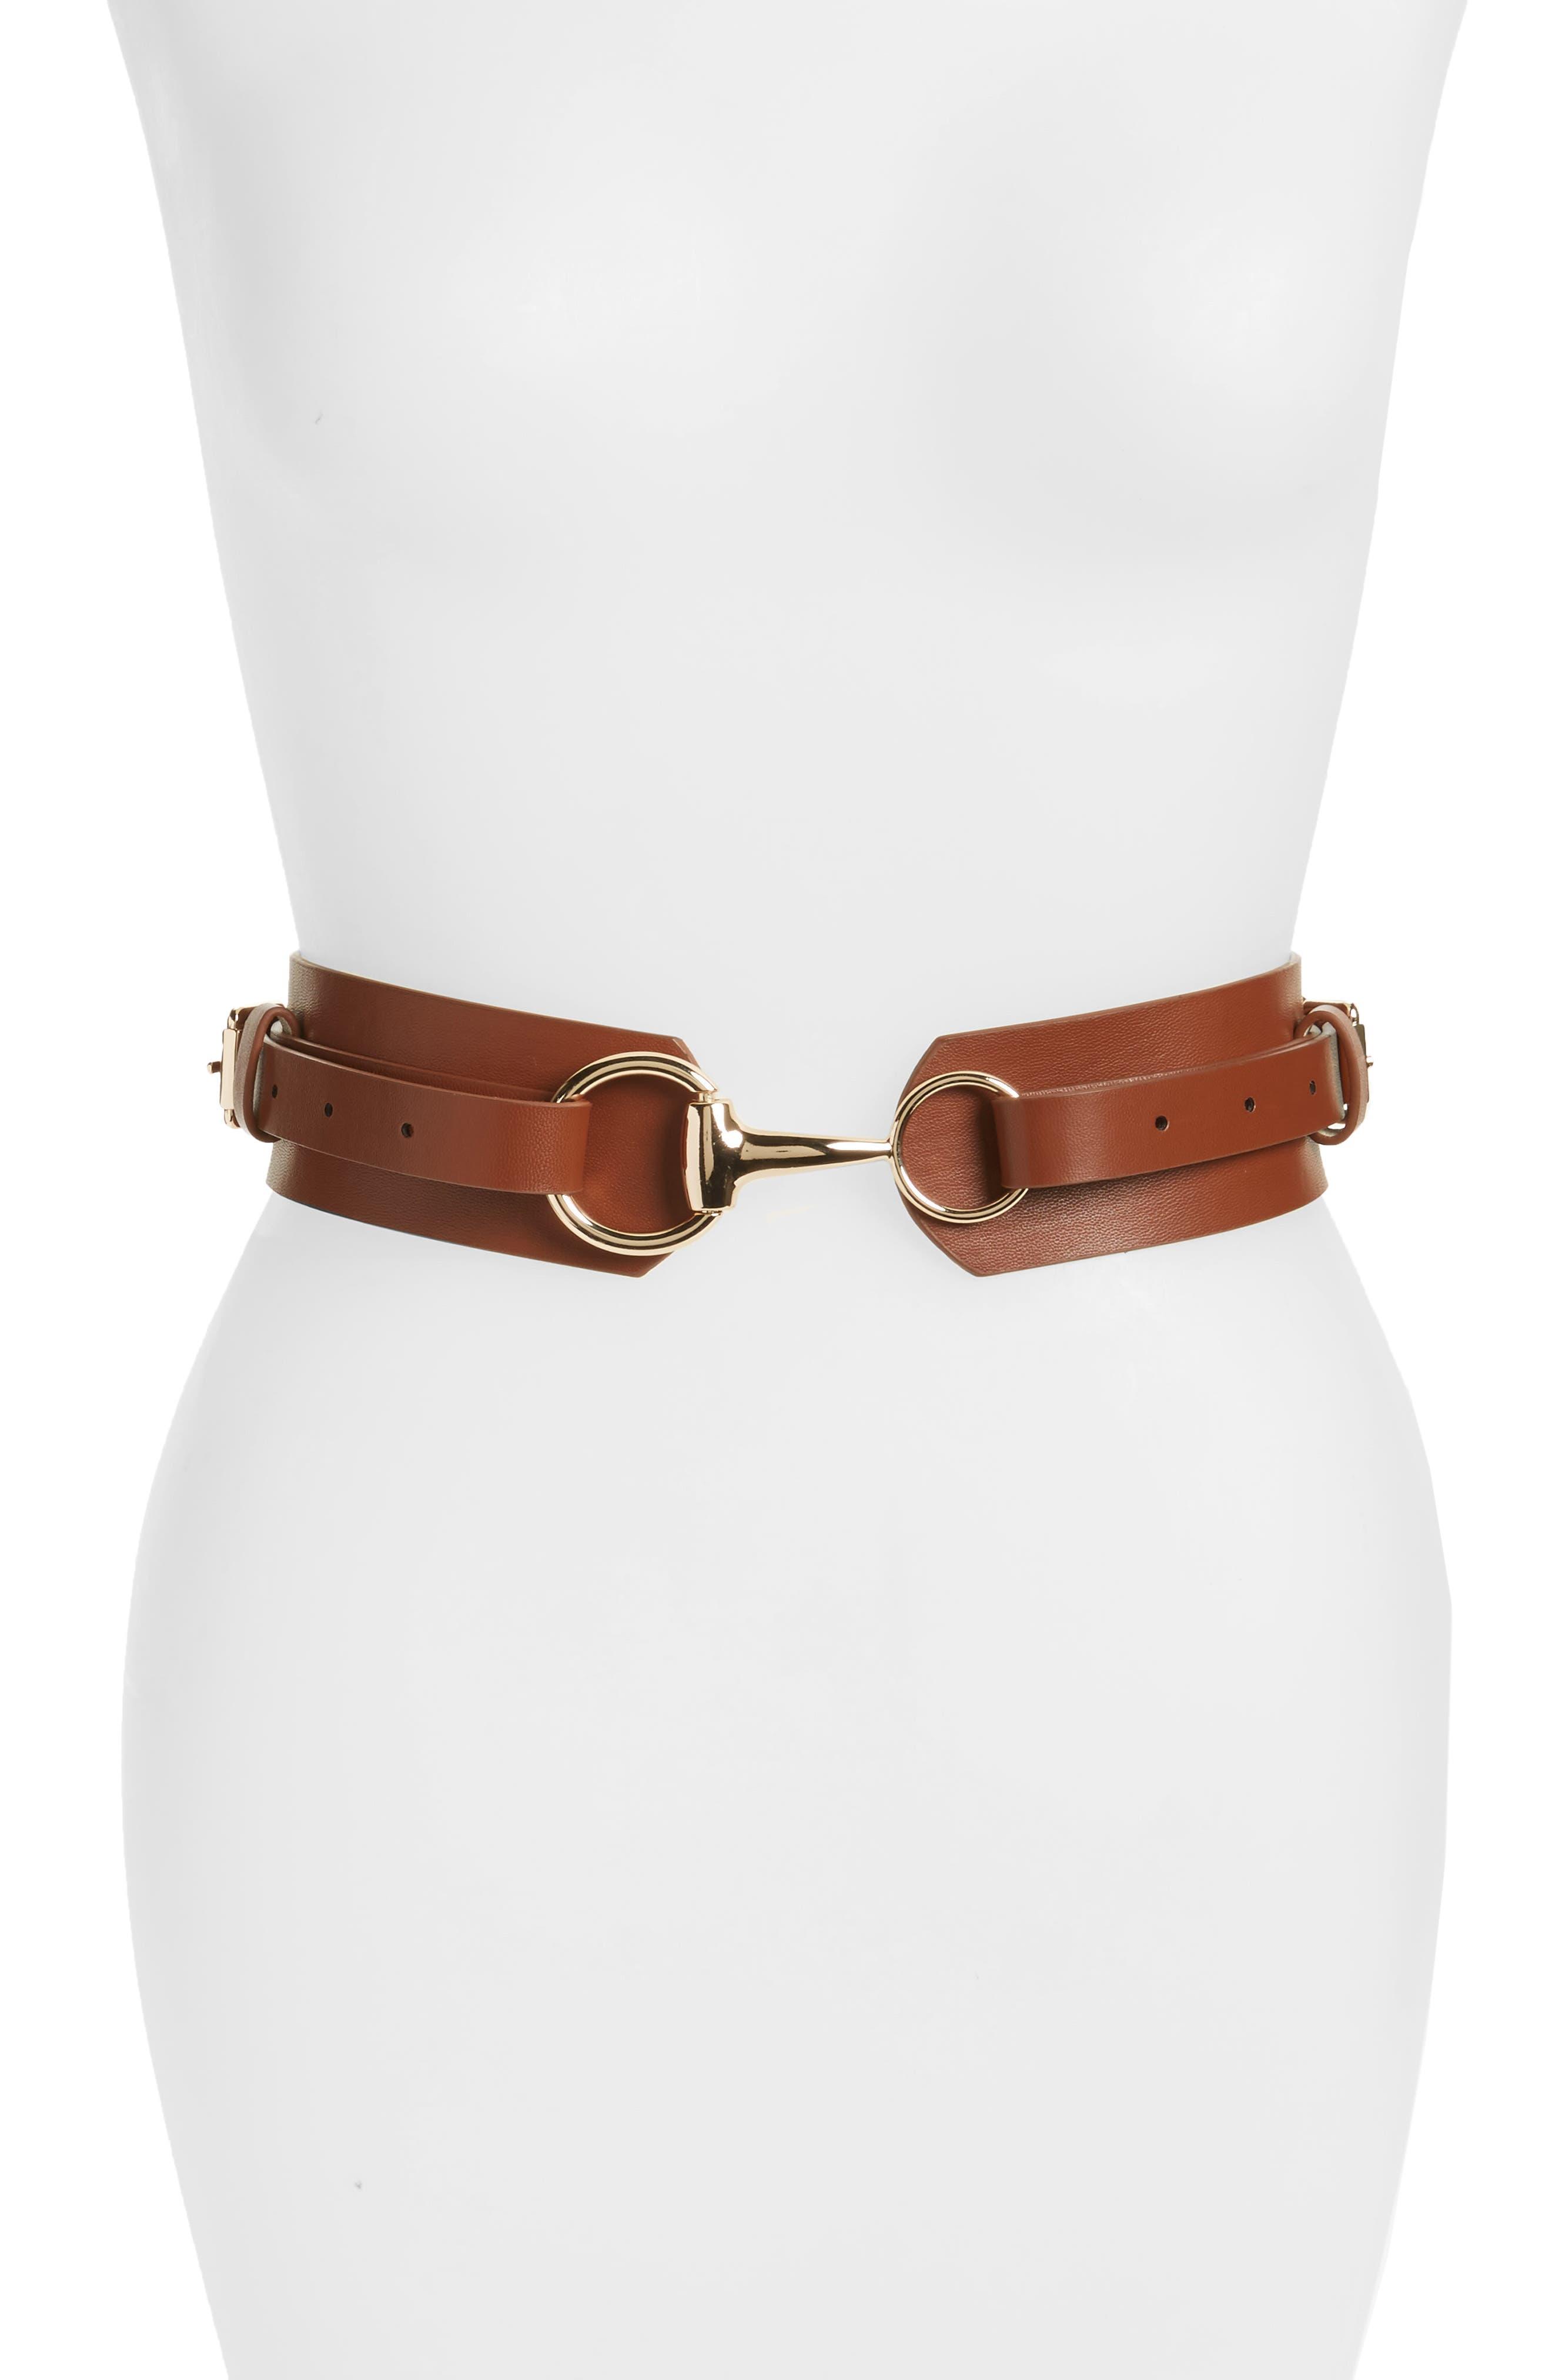 Accessory Collective Faux Leather Equestrian Belt,                         Main,                         color, Cognac/ Gold